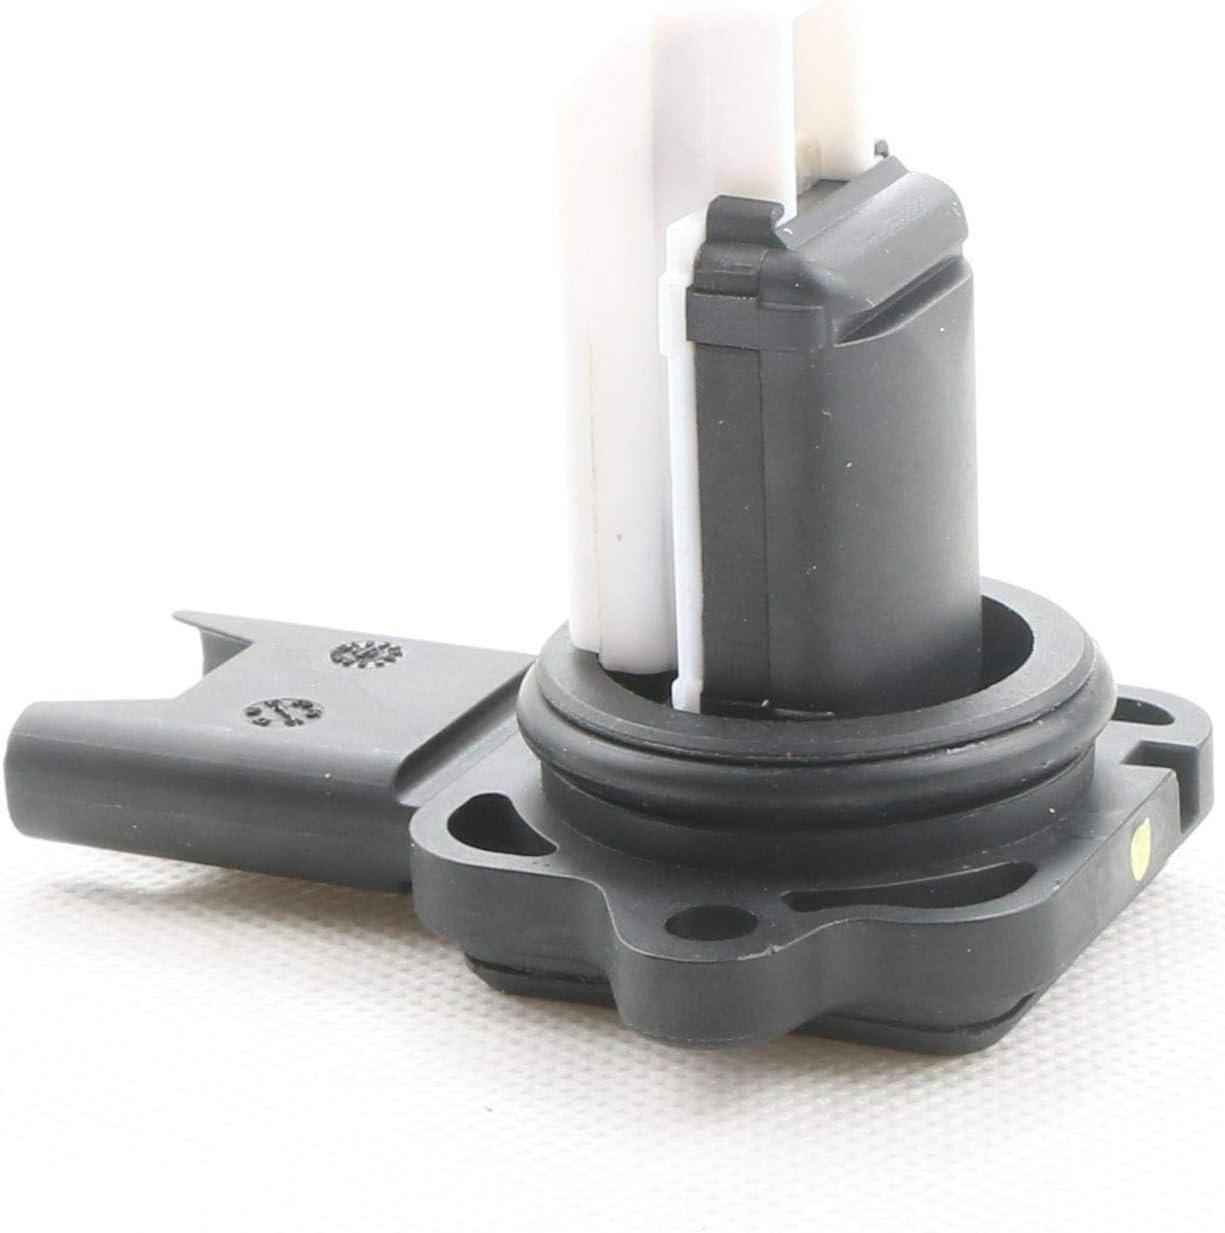 Mass Air Flow Sensor MAF 5WK97508 For BMW X3 X5 Z4 128i 328i 528i 2007-2013